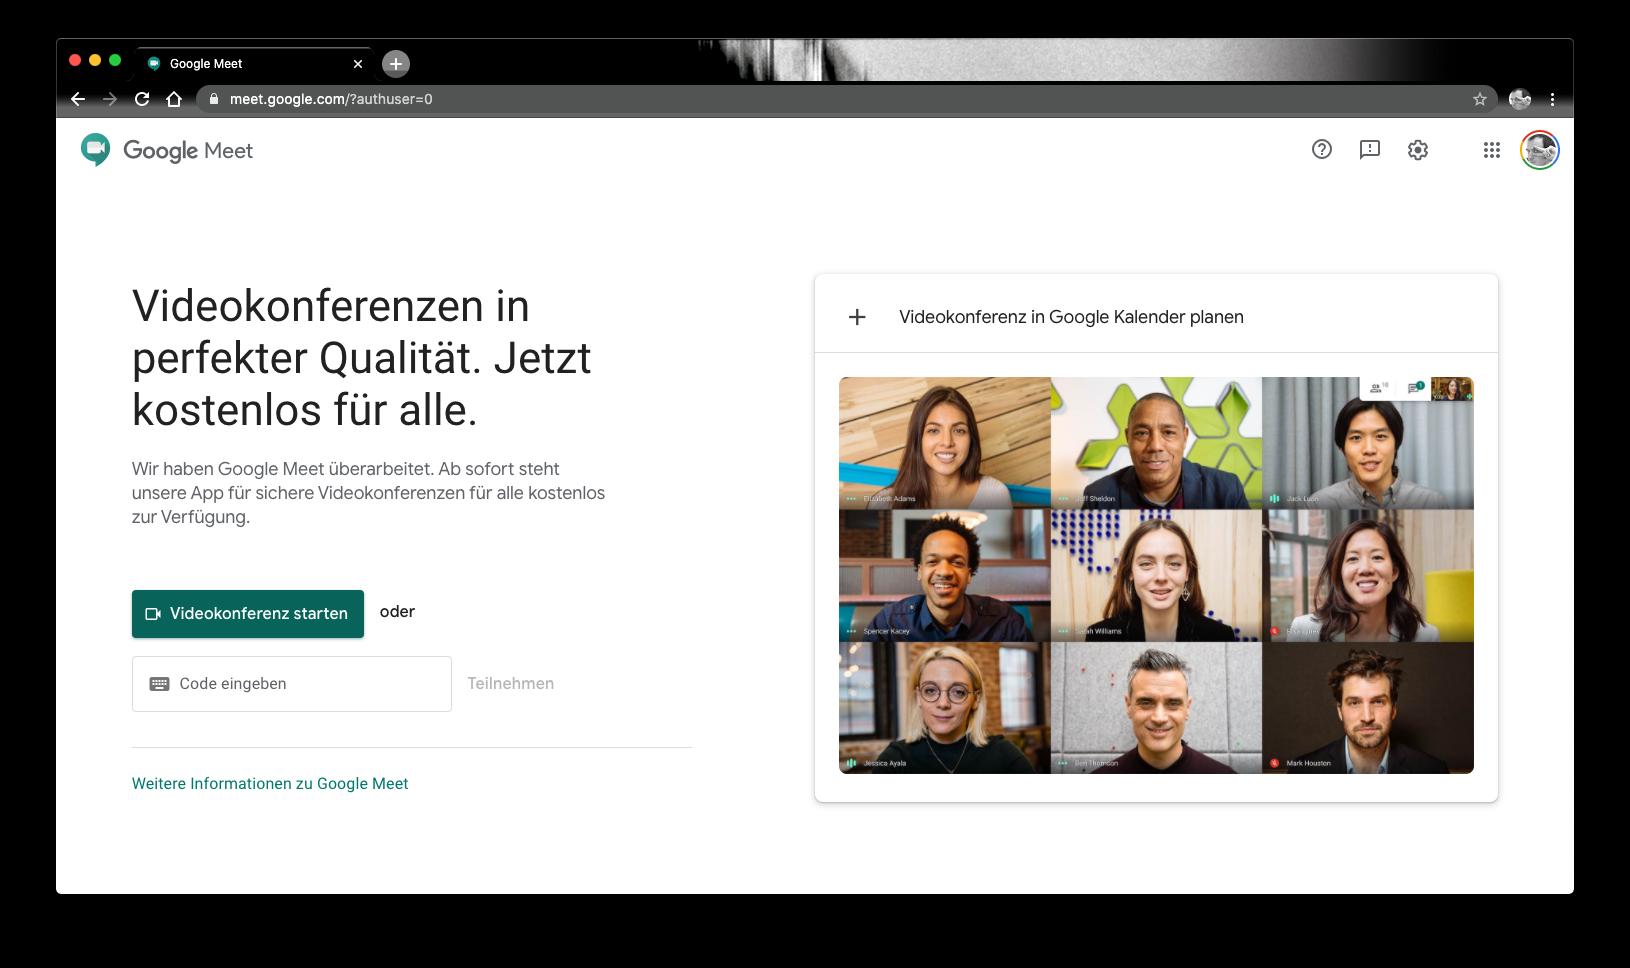 Google Meet Video Konferenz Digital messe